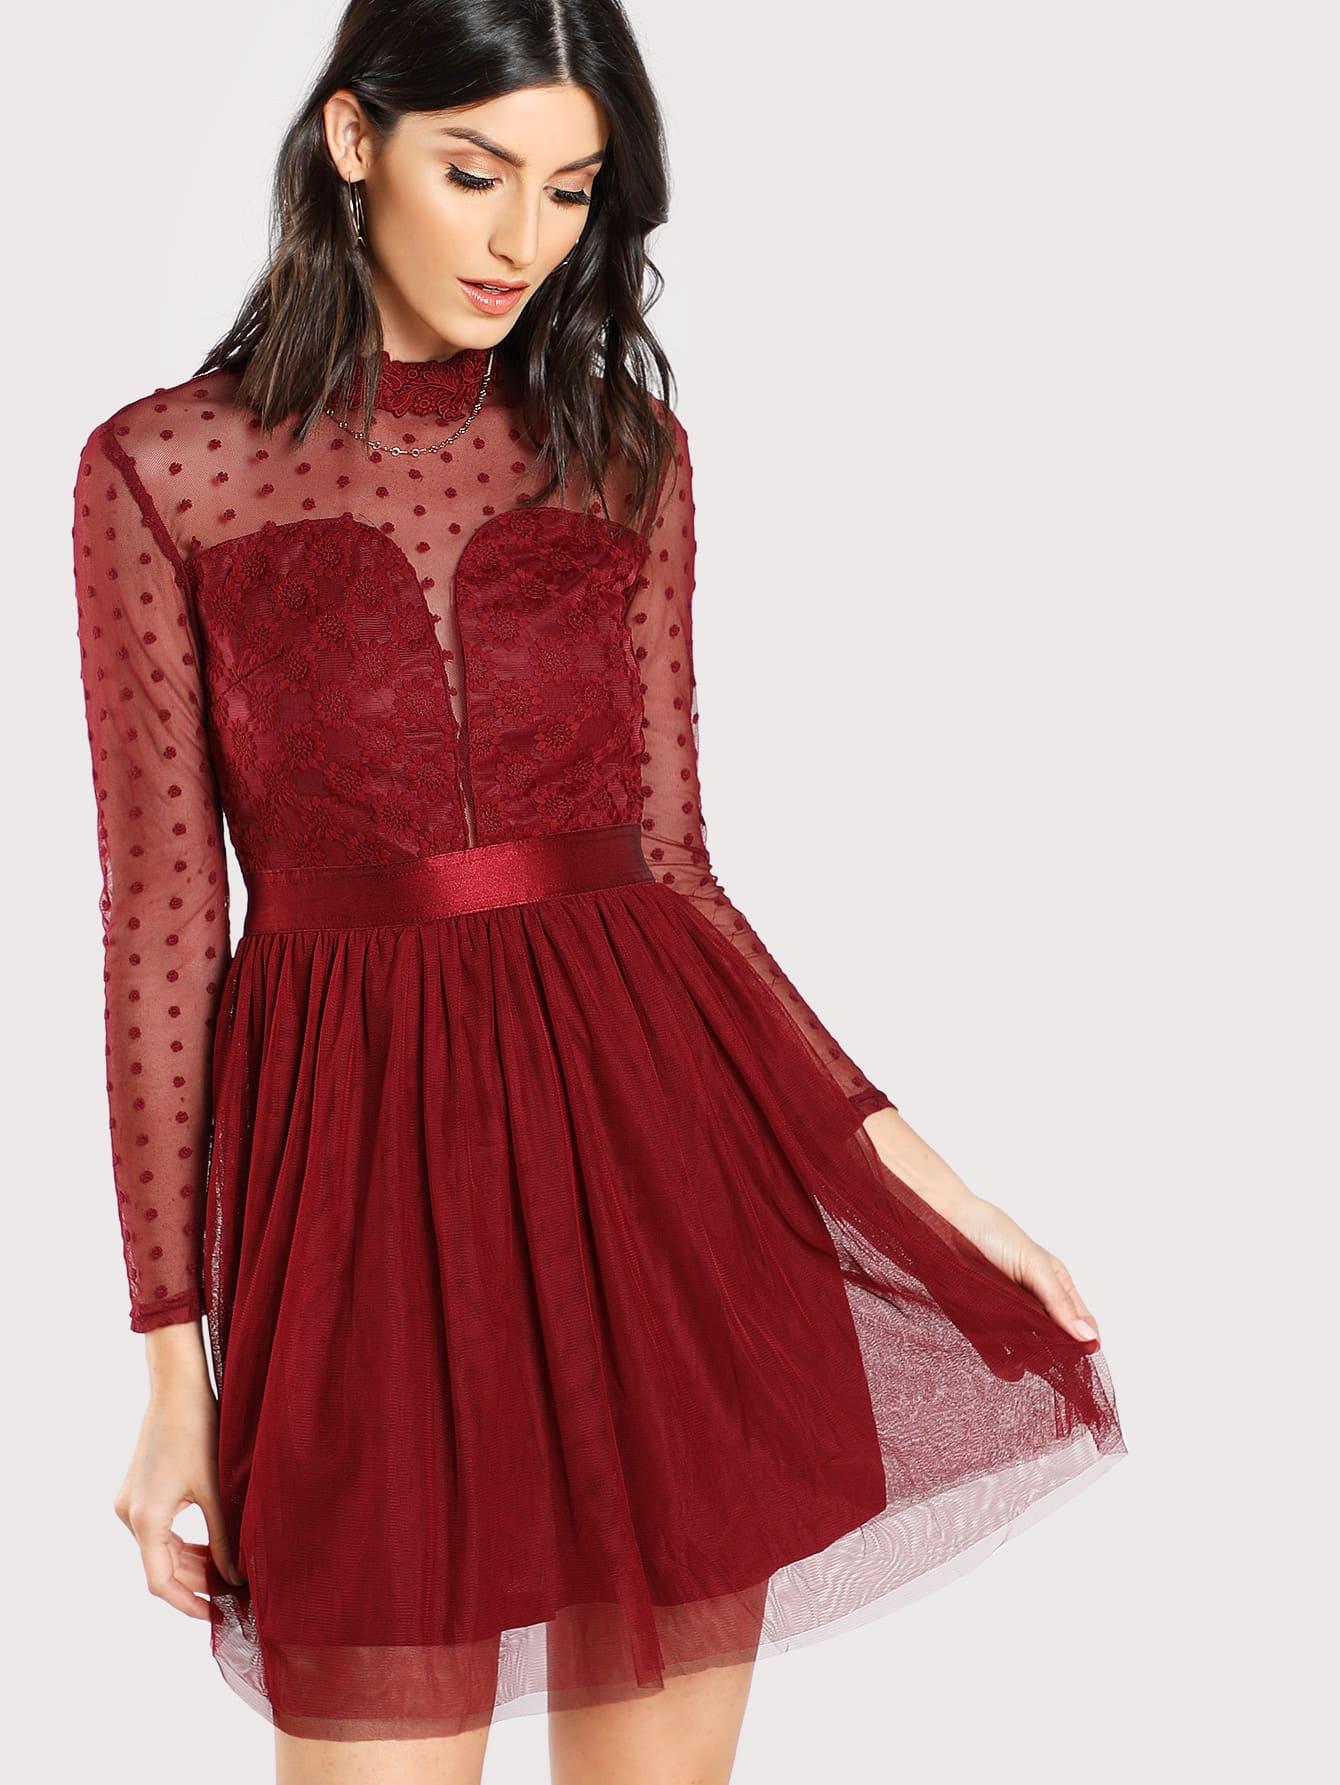 Lace Insert Polka Dot Mesh Dress plus size mesh insert polka dot dress